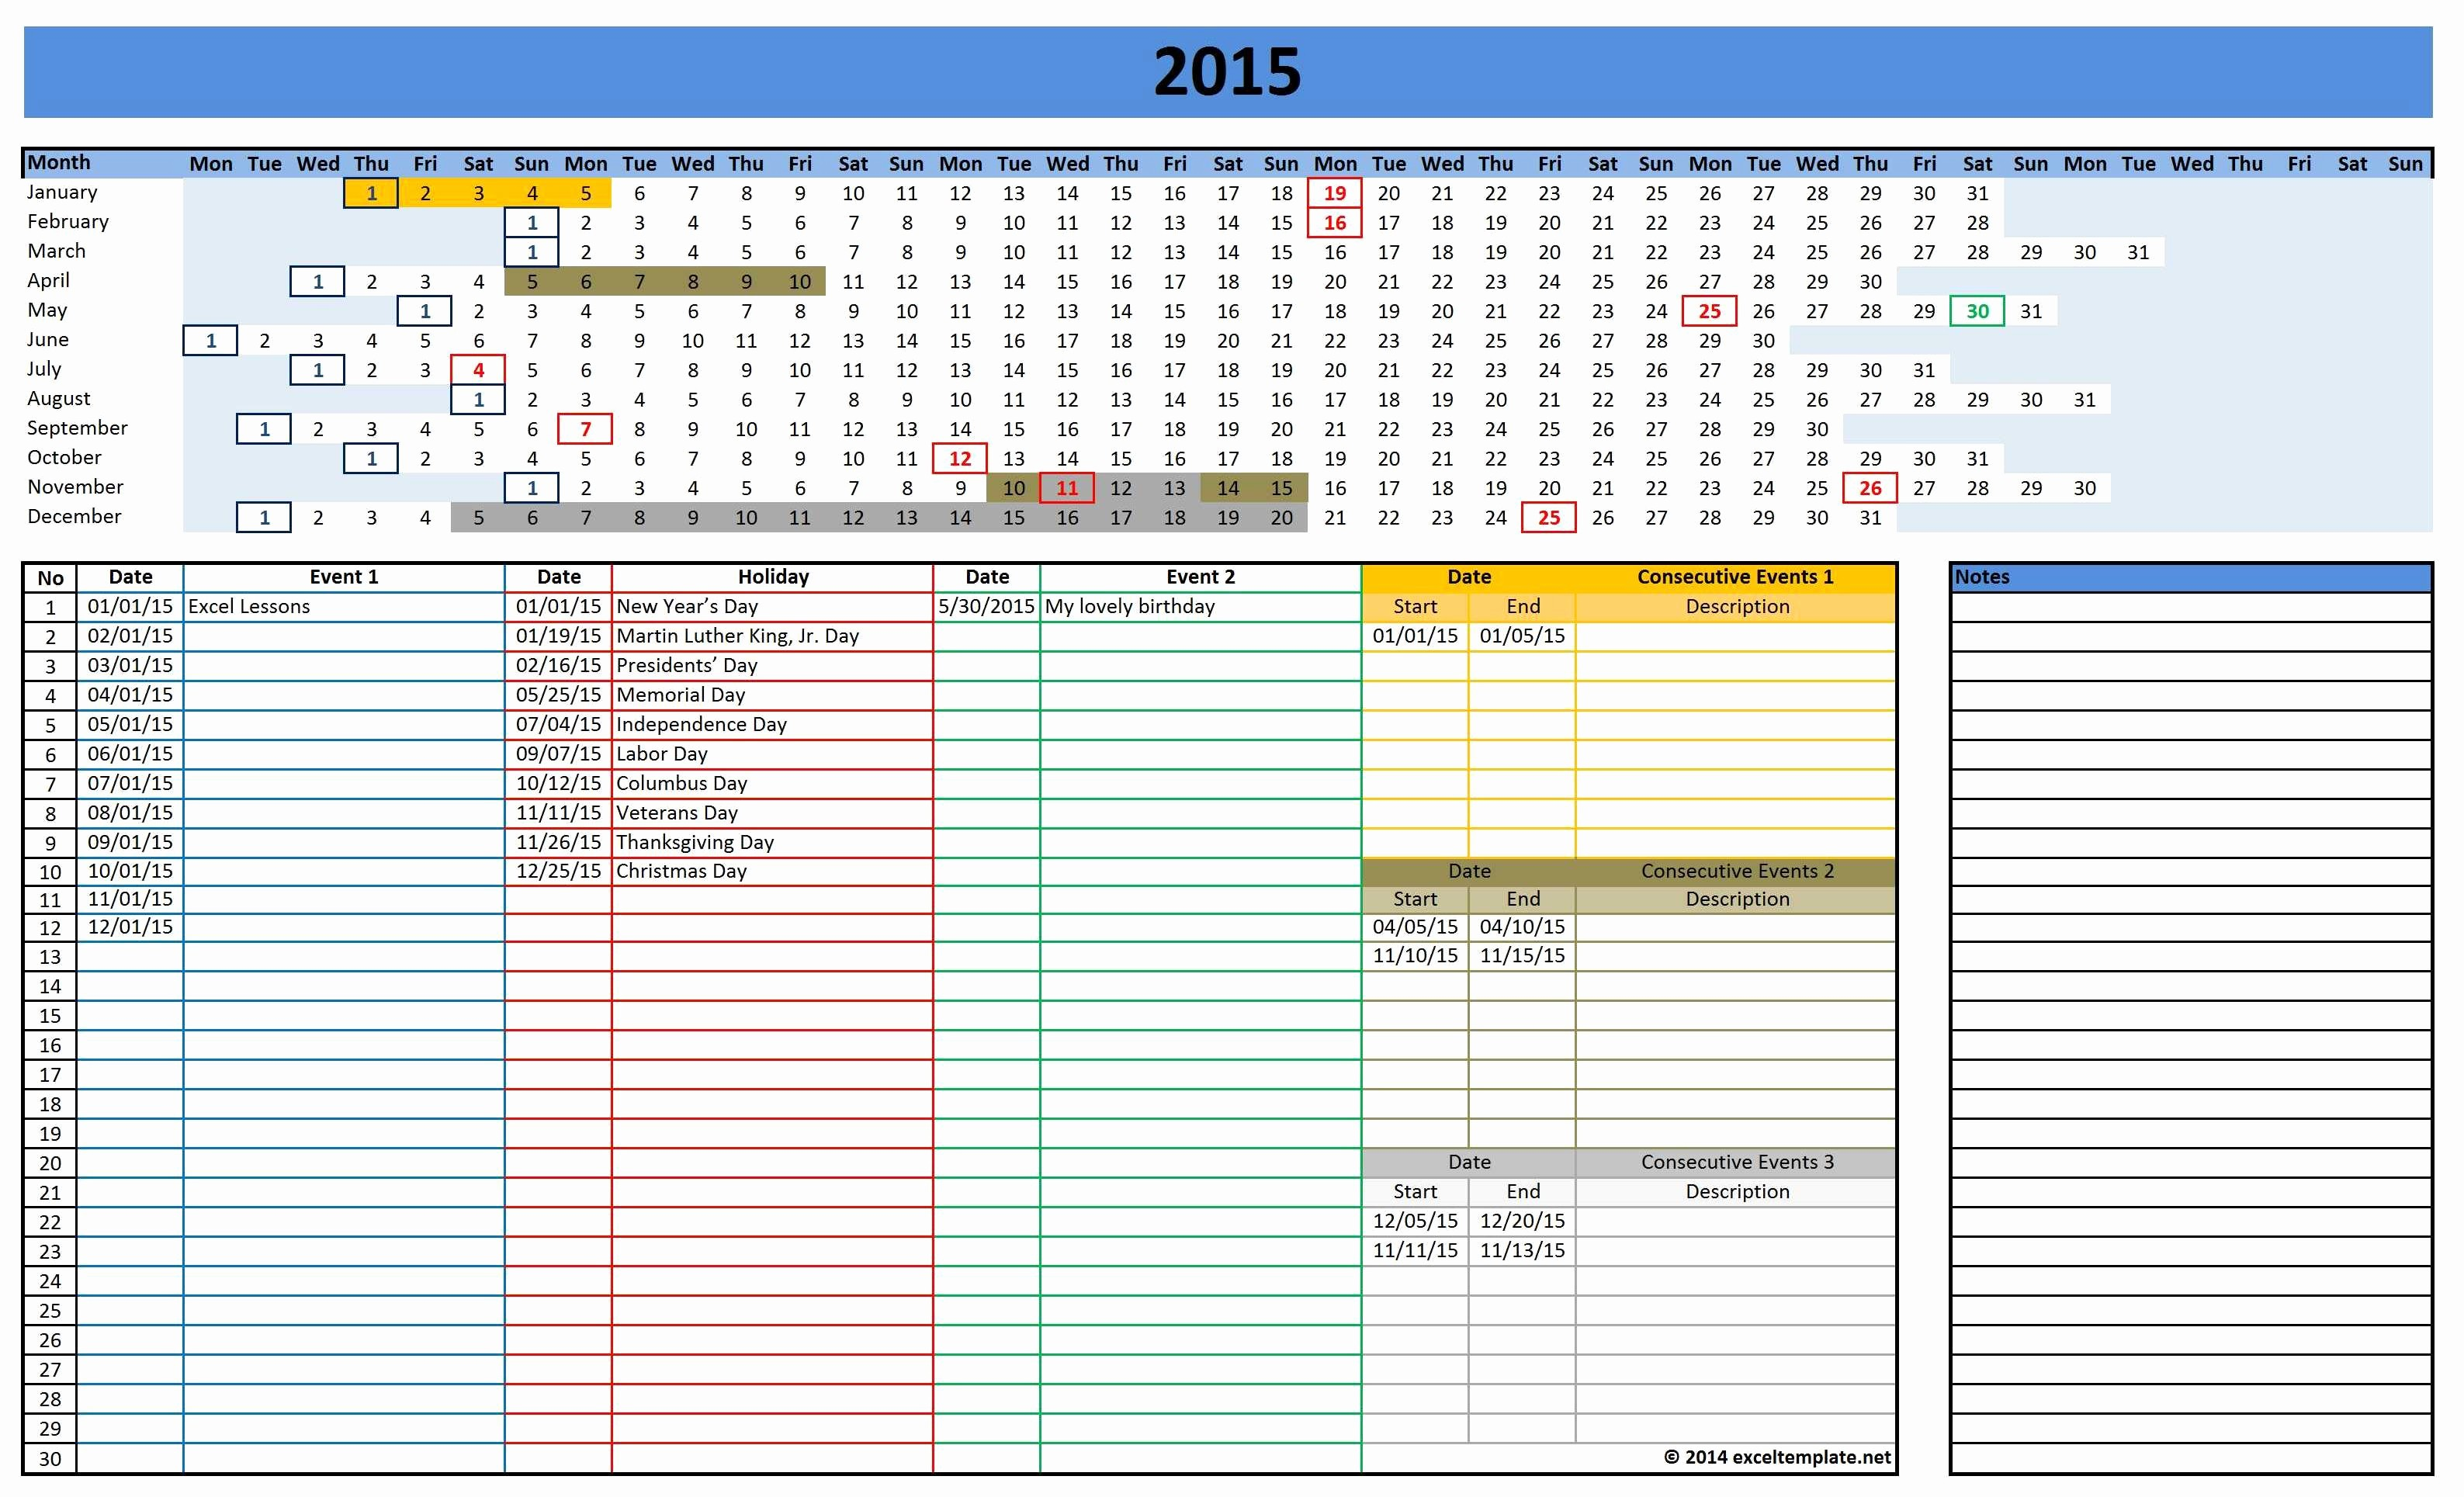 Calendar Of events Template 2015 Luxury 2016 Calendars